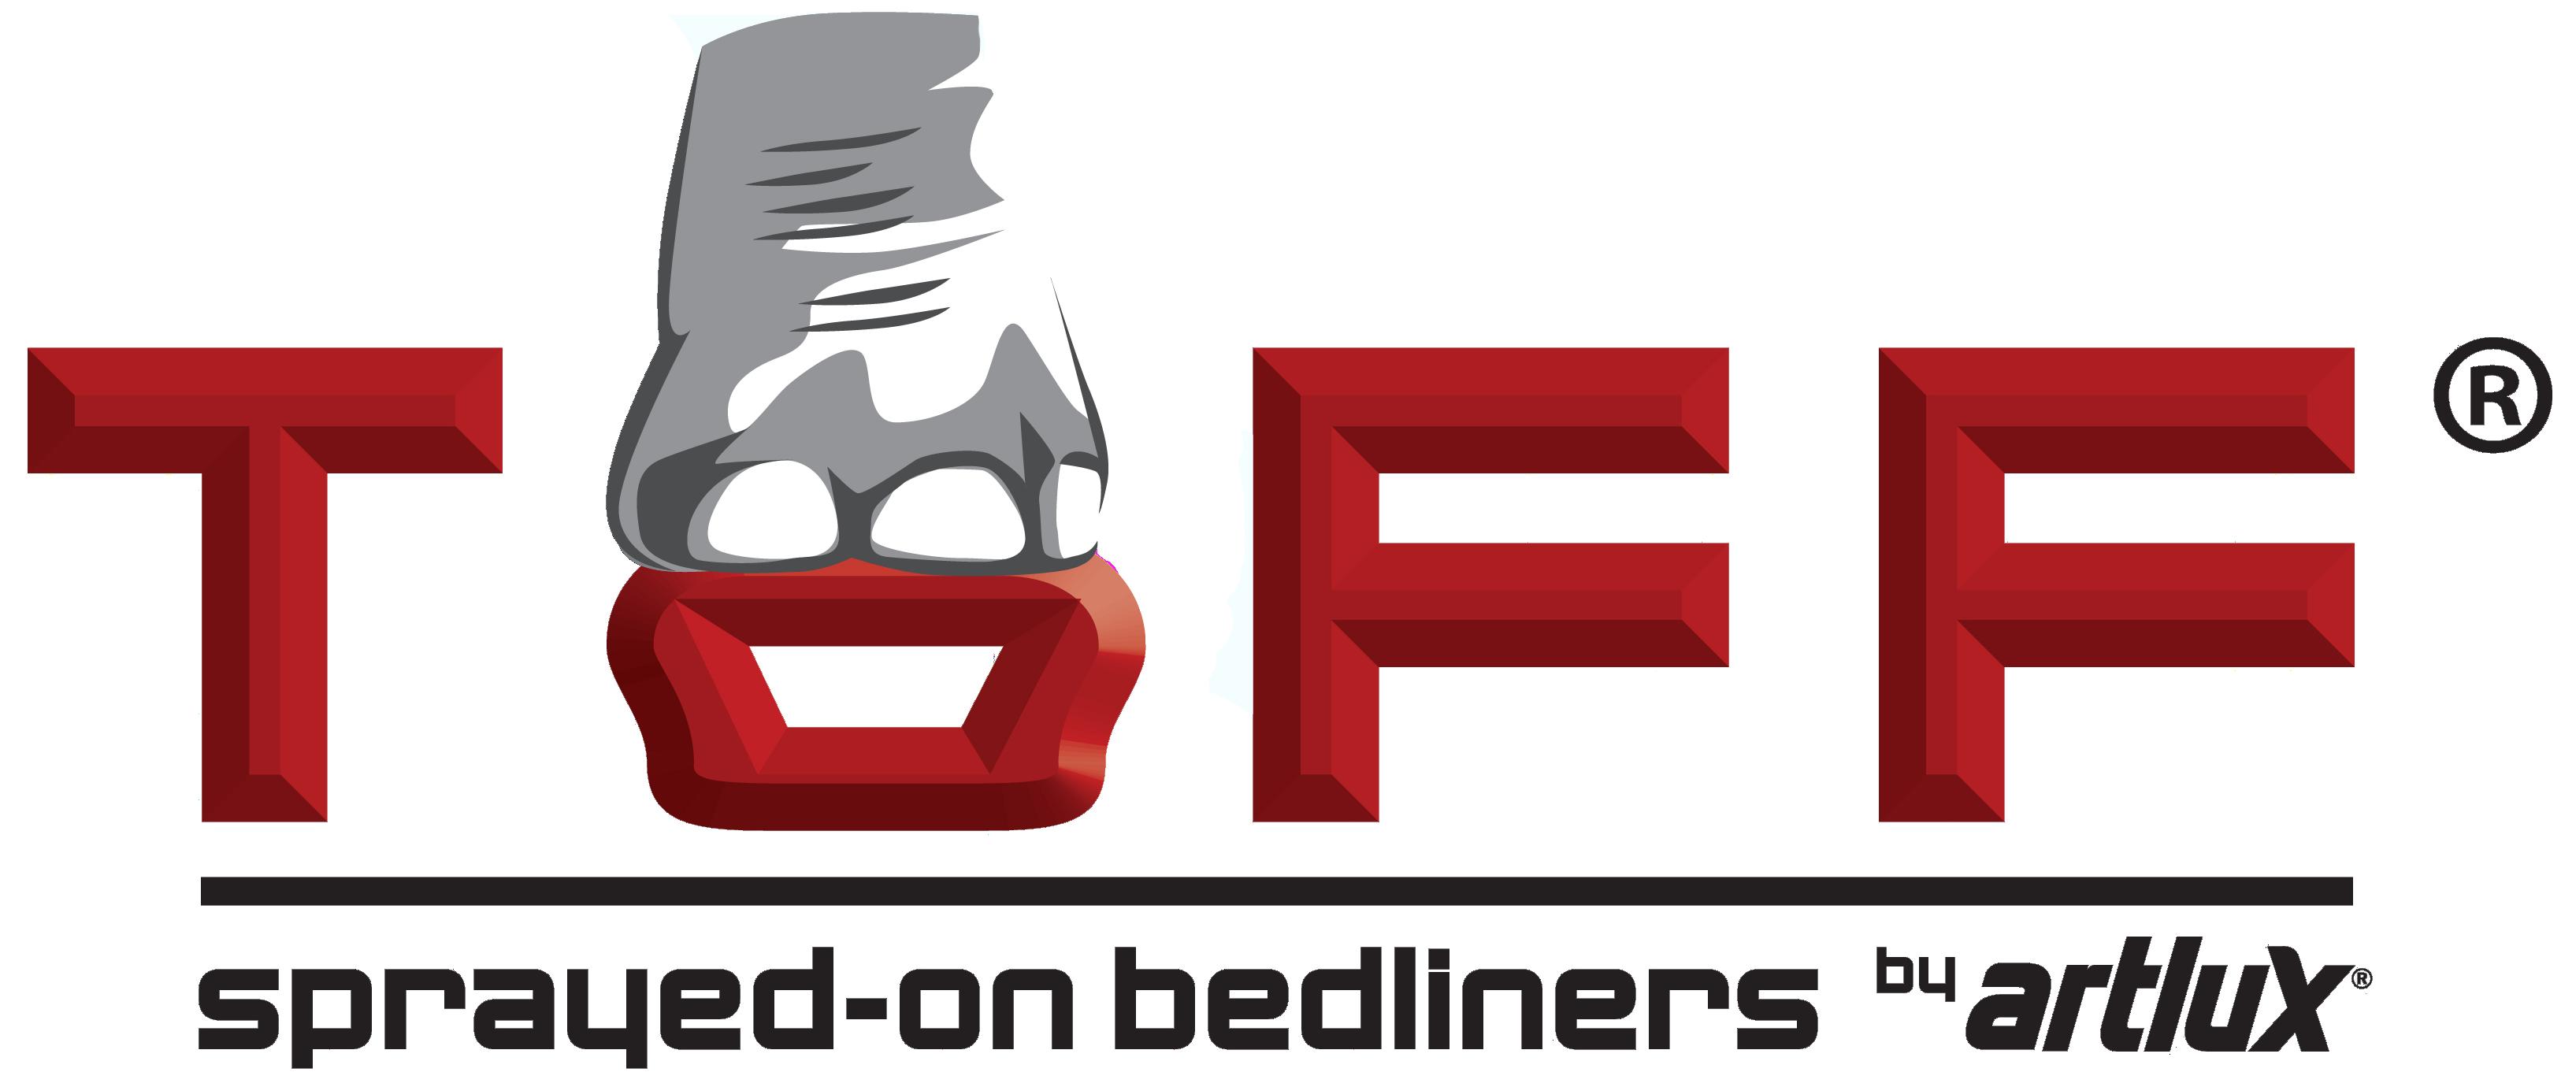 TOFF Sprayed-On Bedliners